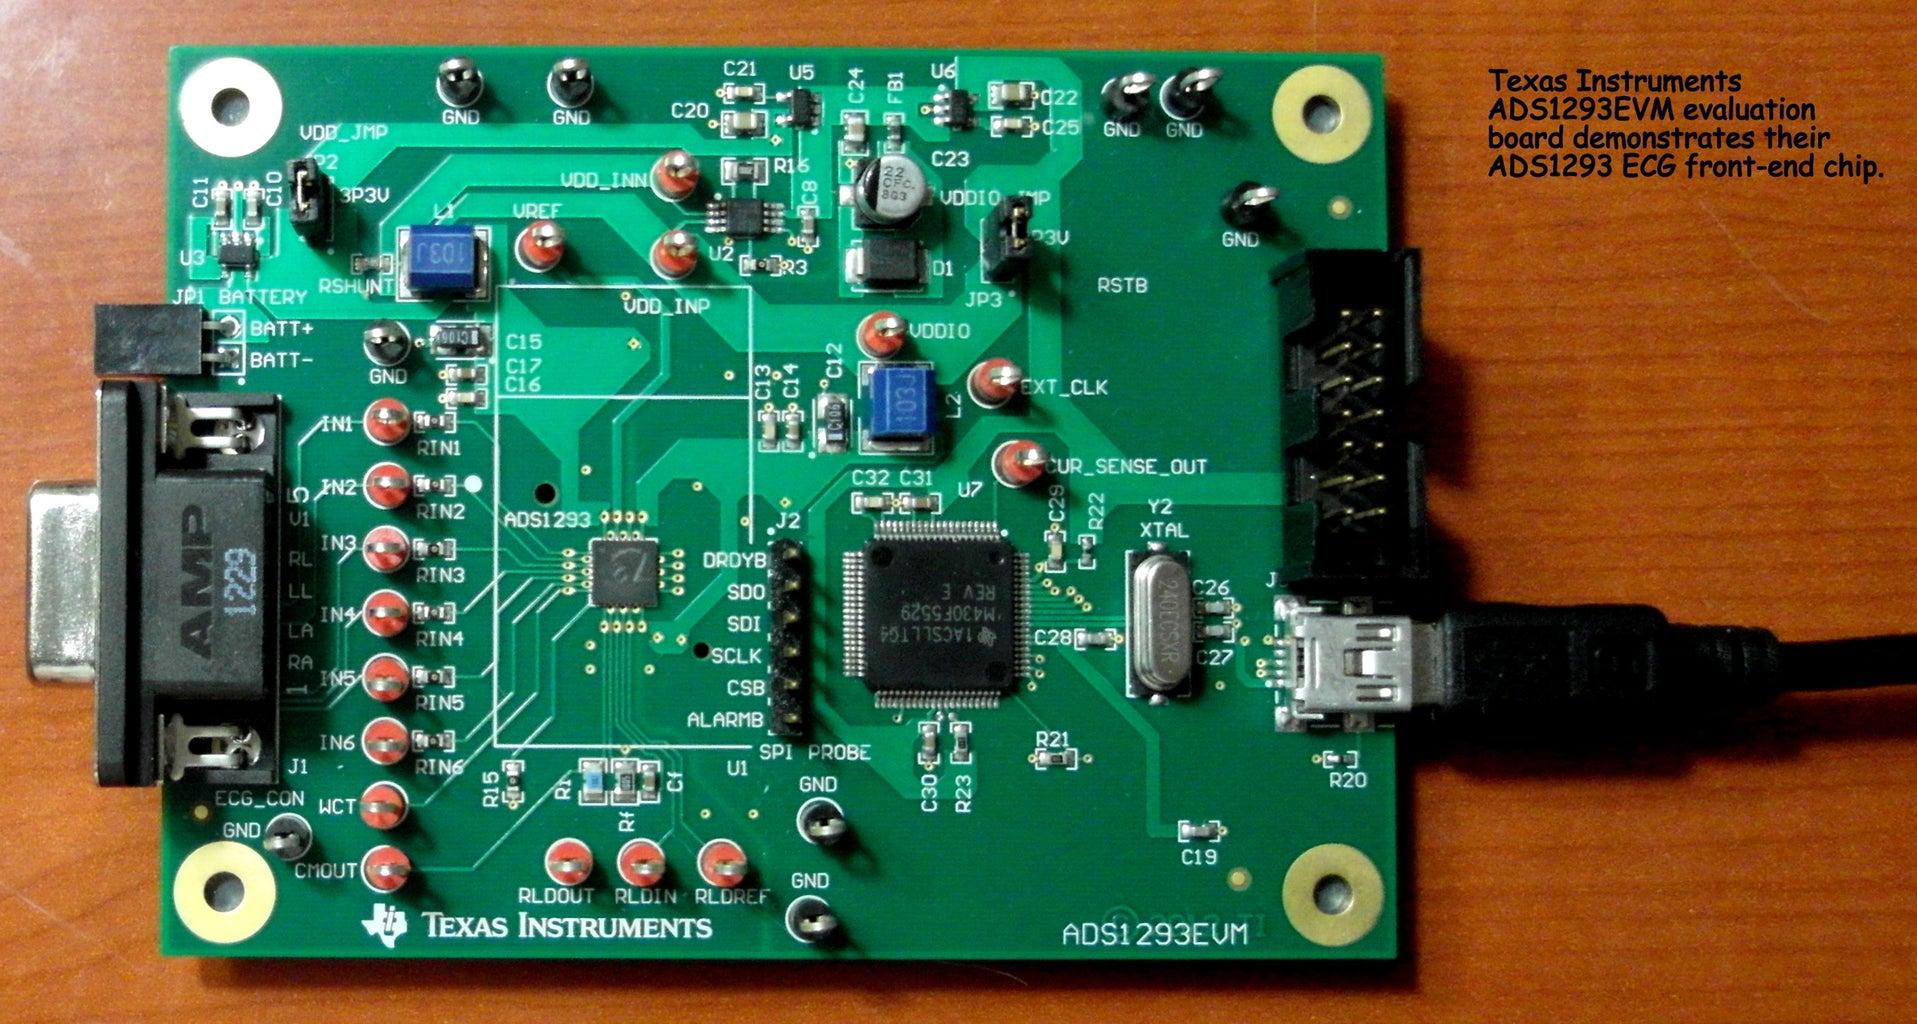 TI ADS1293 Single Chip Heart Monitor